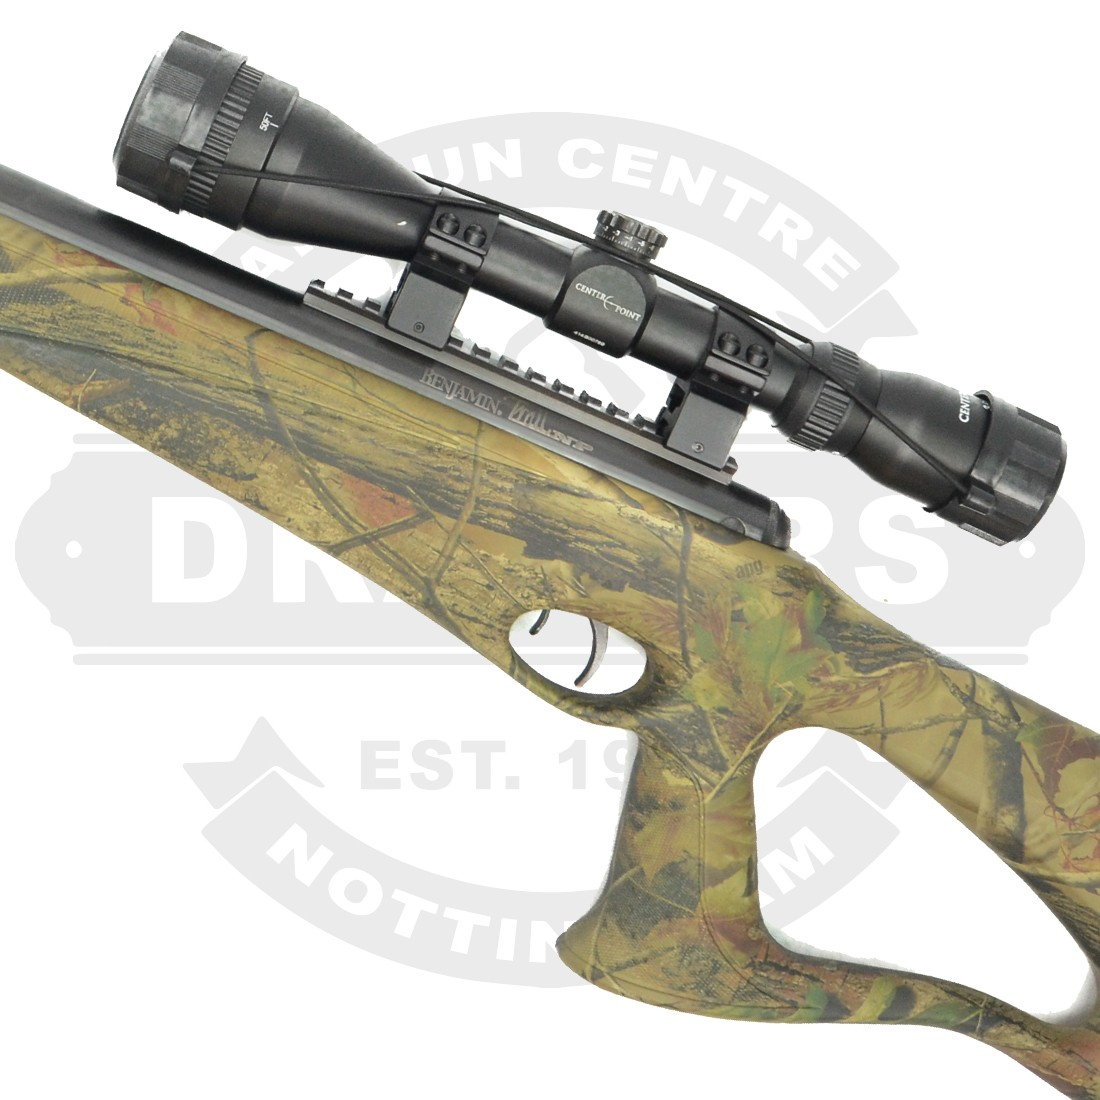 Benjamin Trail Nitro Piston Camo APG Stock  22 - Air Rifles